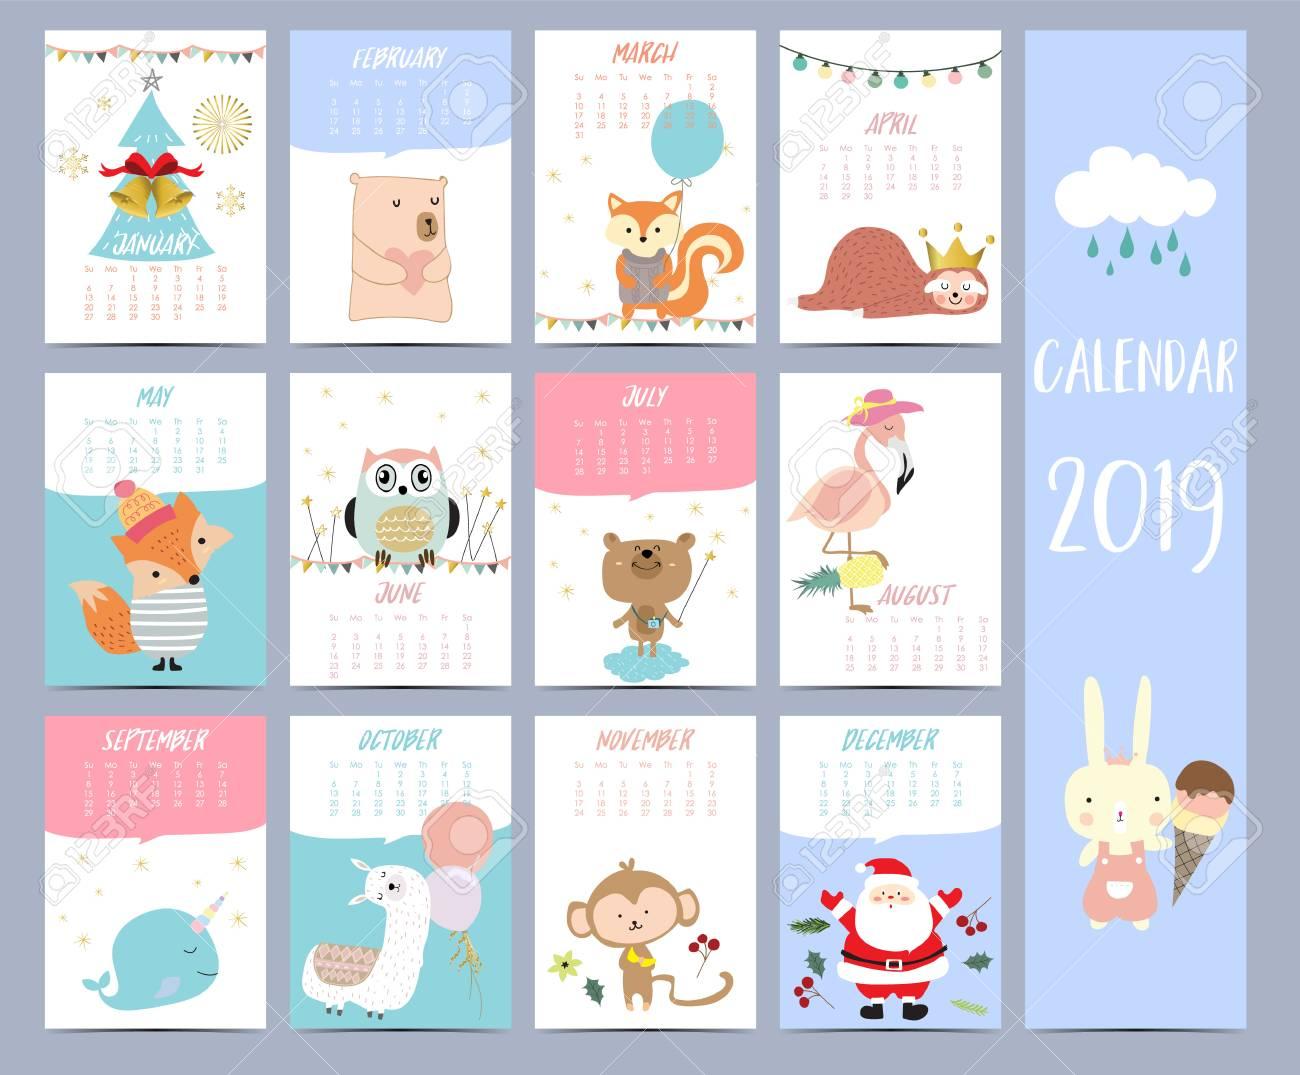 Christmas 2019 Calendar.Doodle Calendar Set 2019 With Santa Claus Christmas Tree Bear